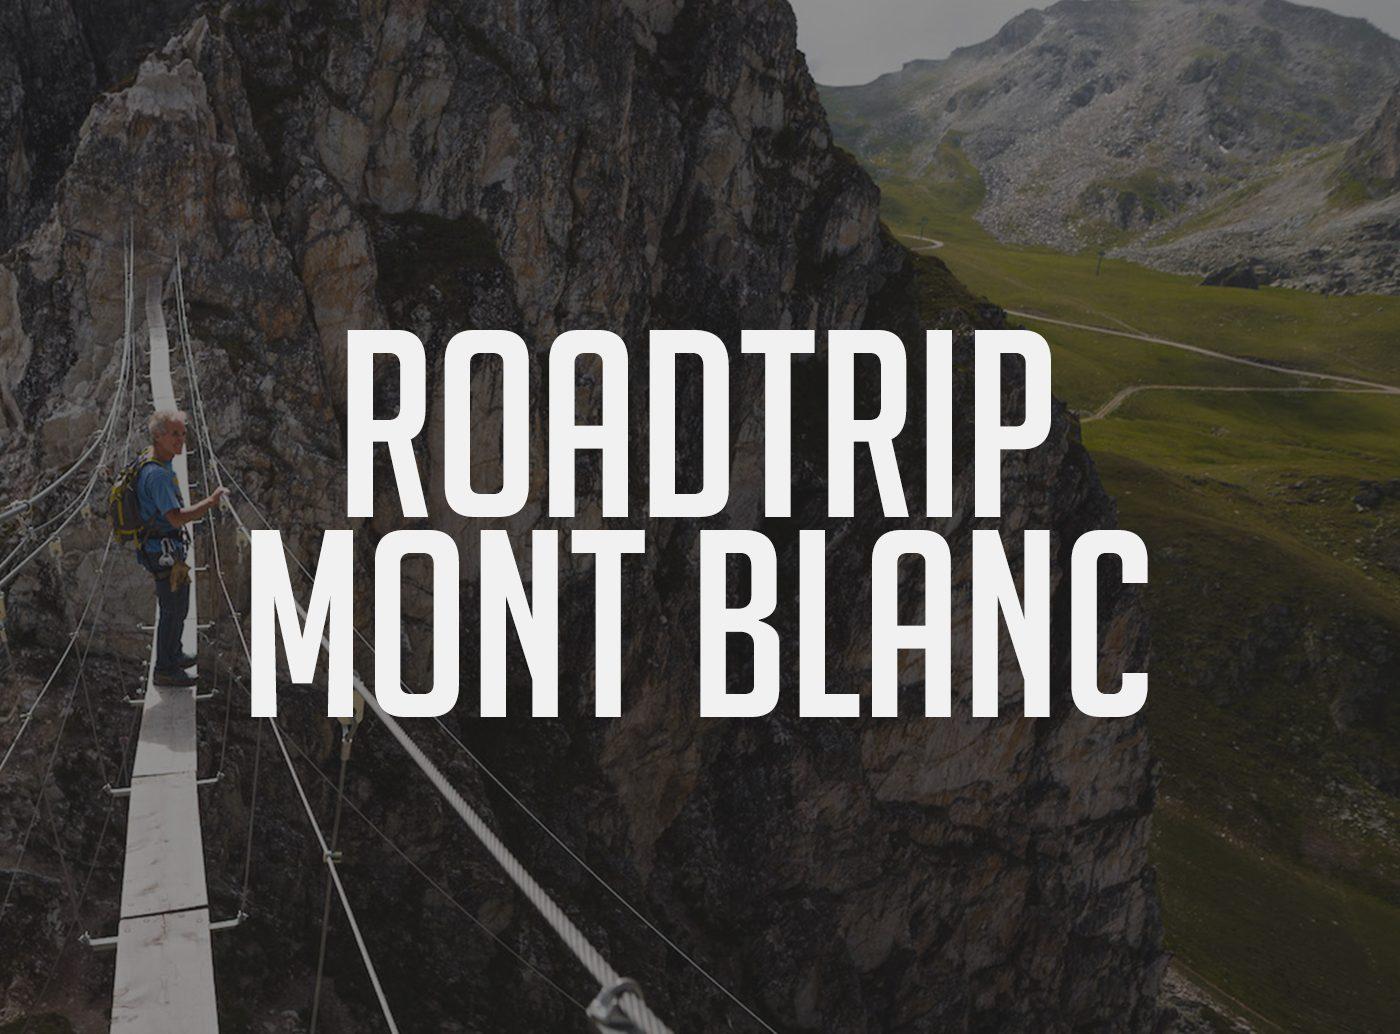 roadtrip mont blanc